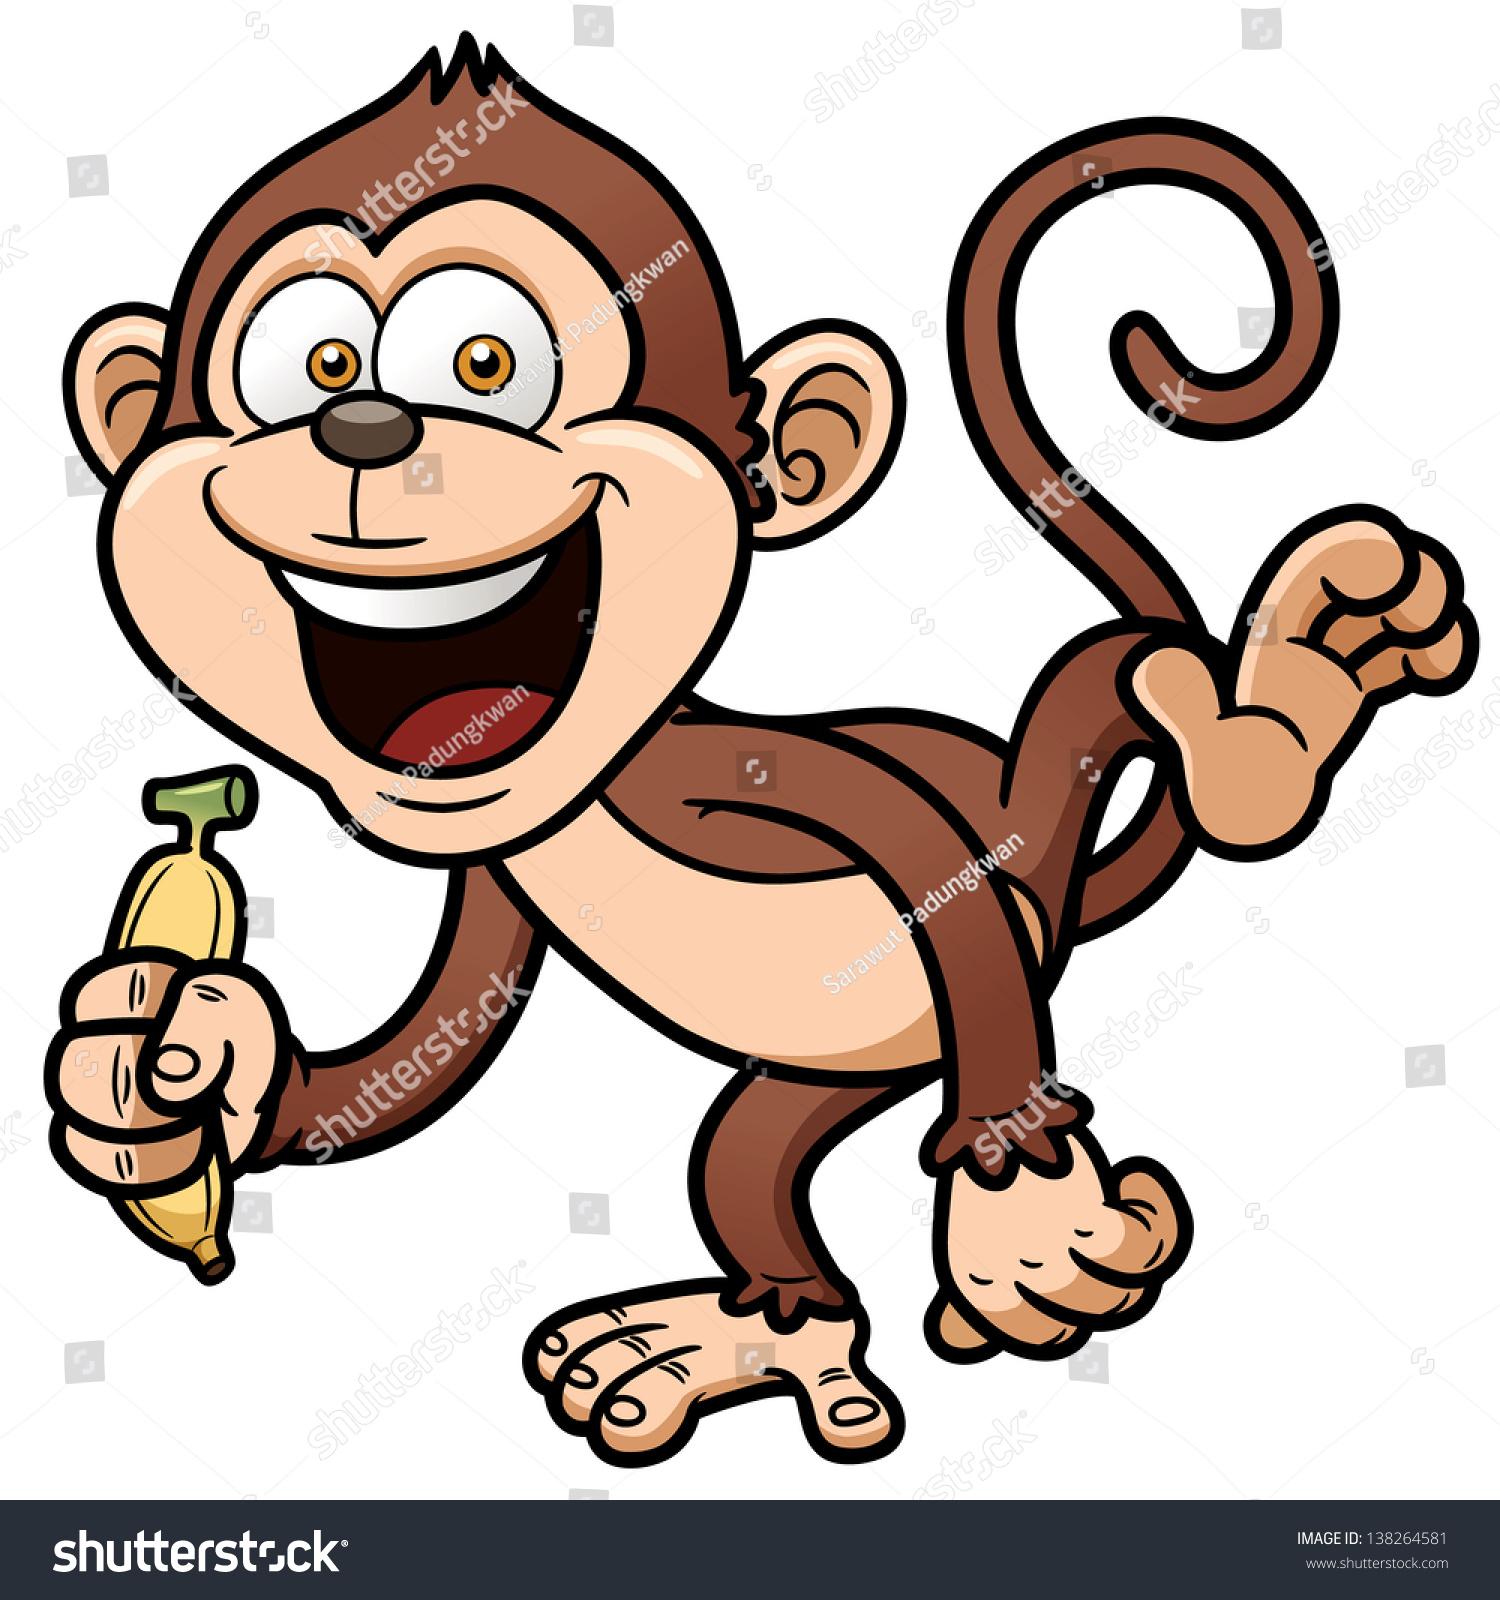 vector illustration cartoon monkey banana stock vector 138264581